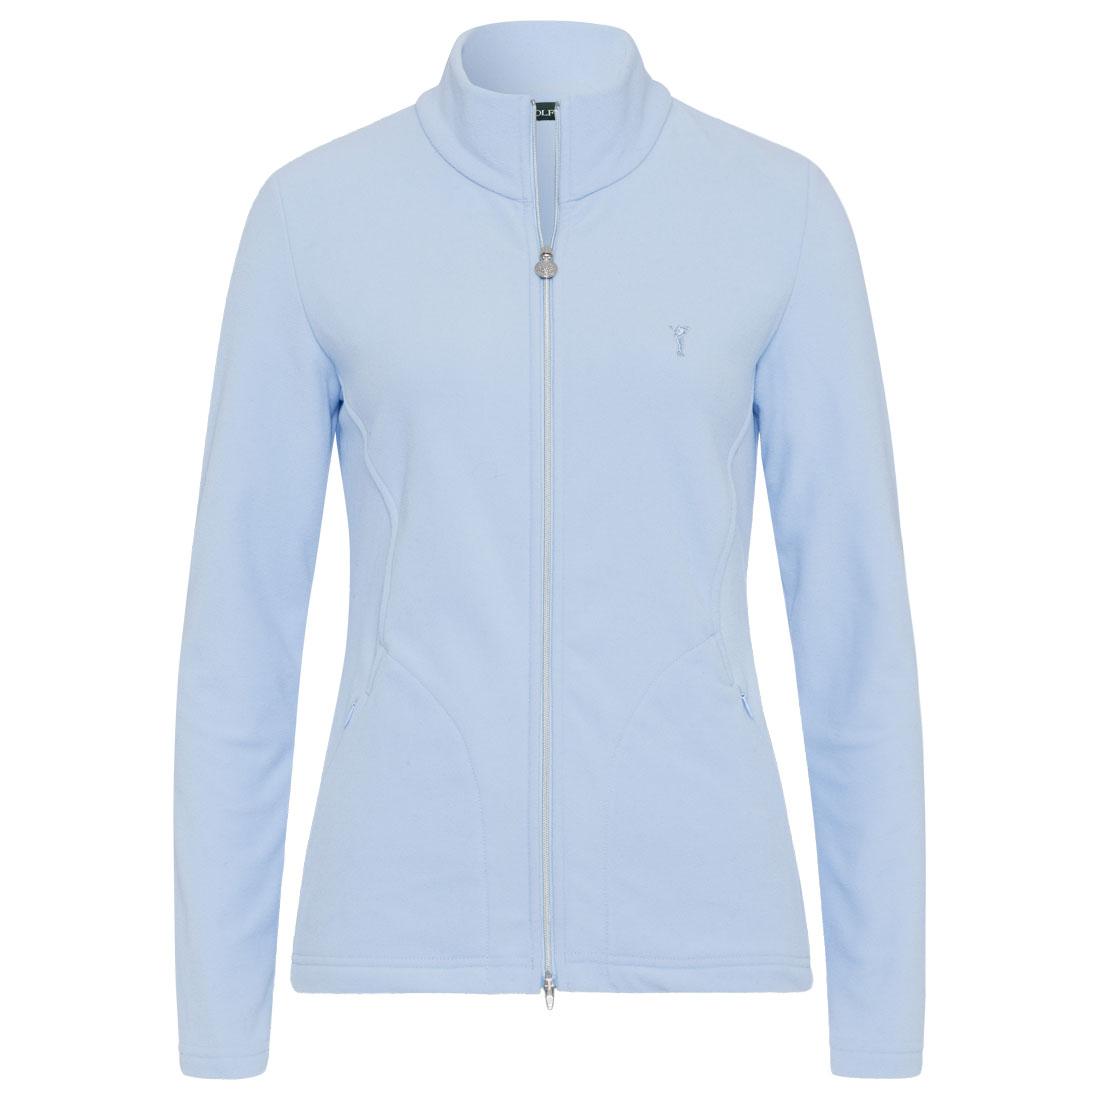 Stretch Fleece Golfjacke Cold Protection